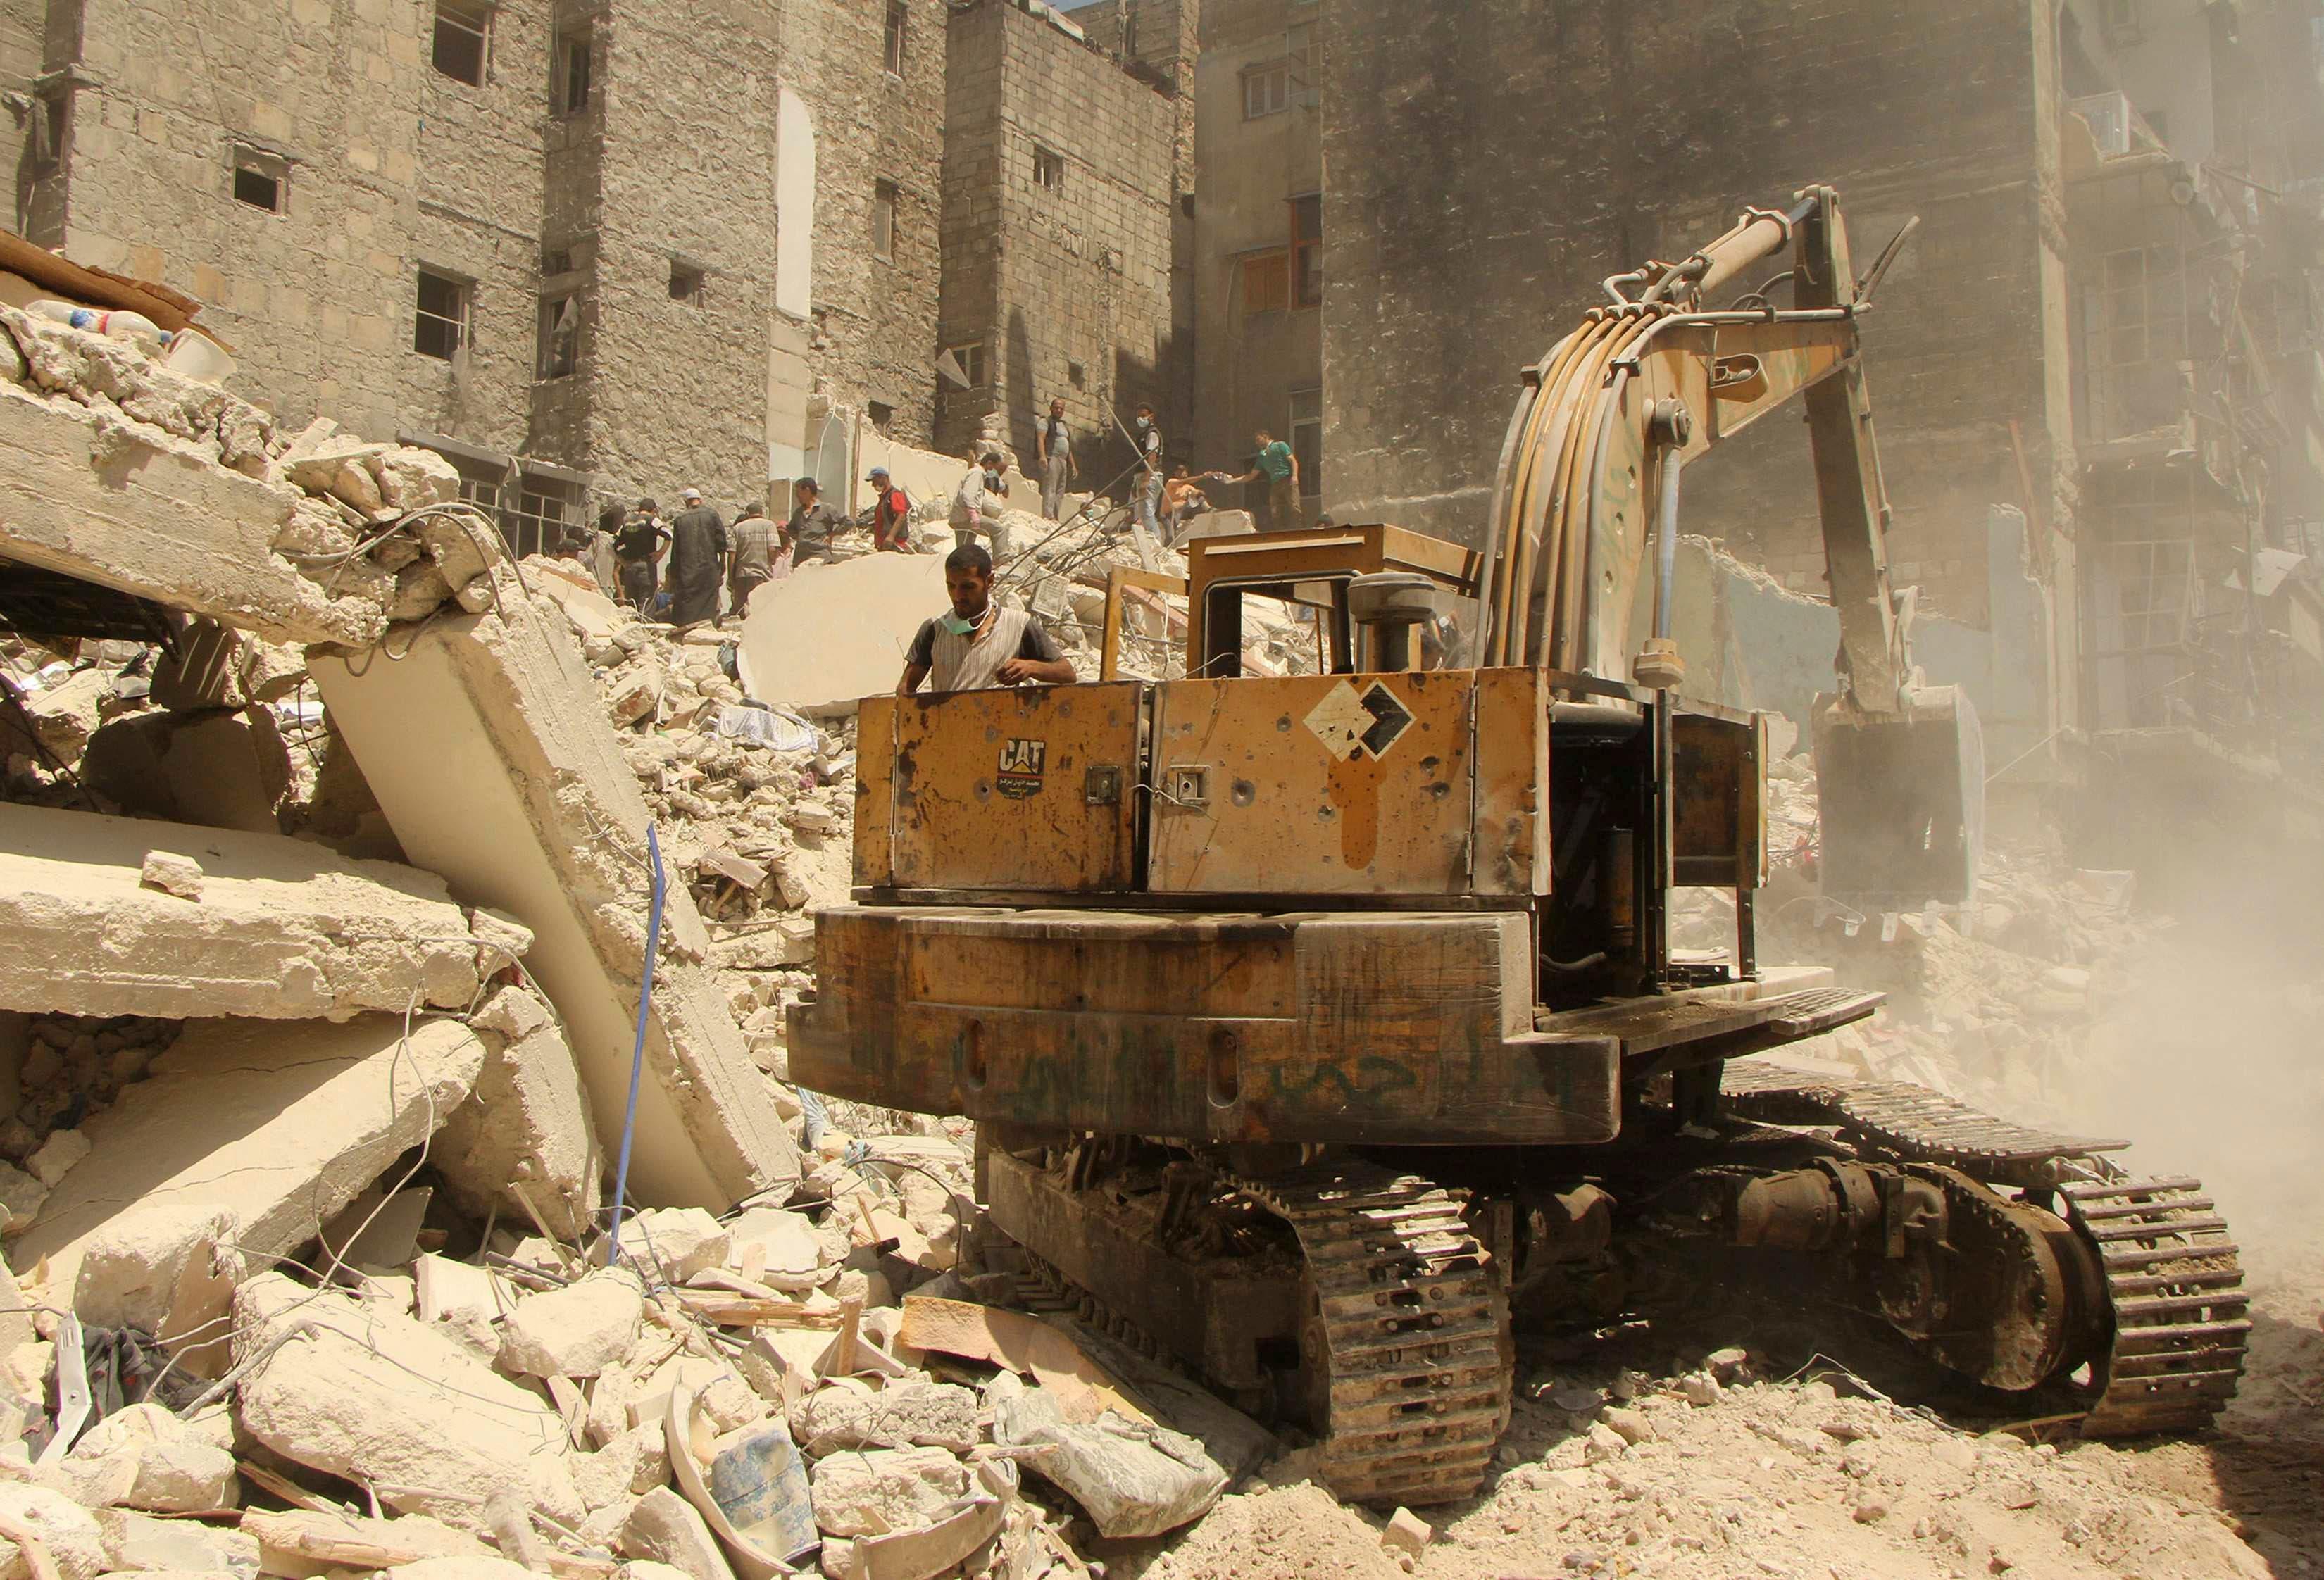 Syrians search for survivors under rubble